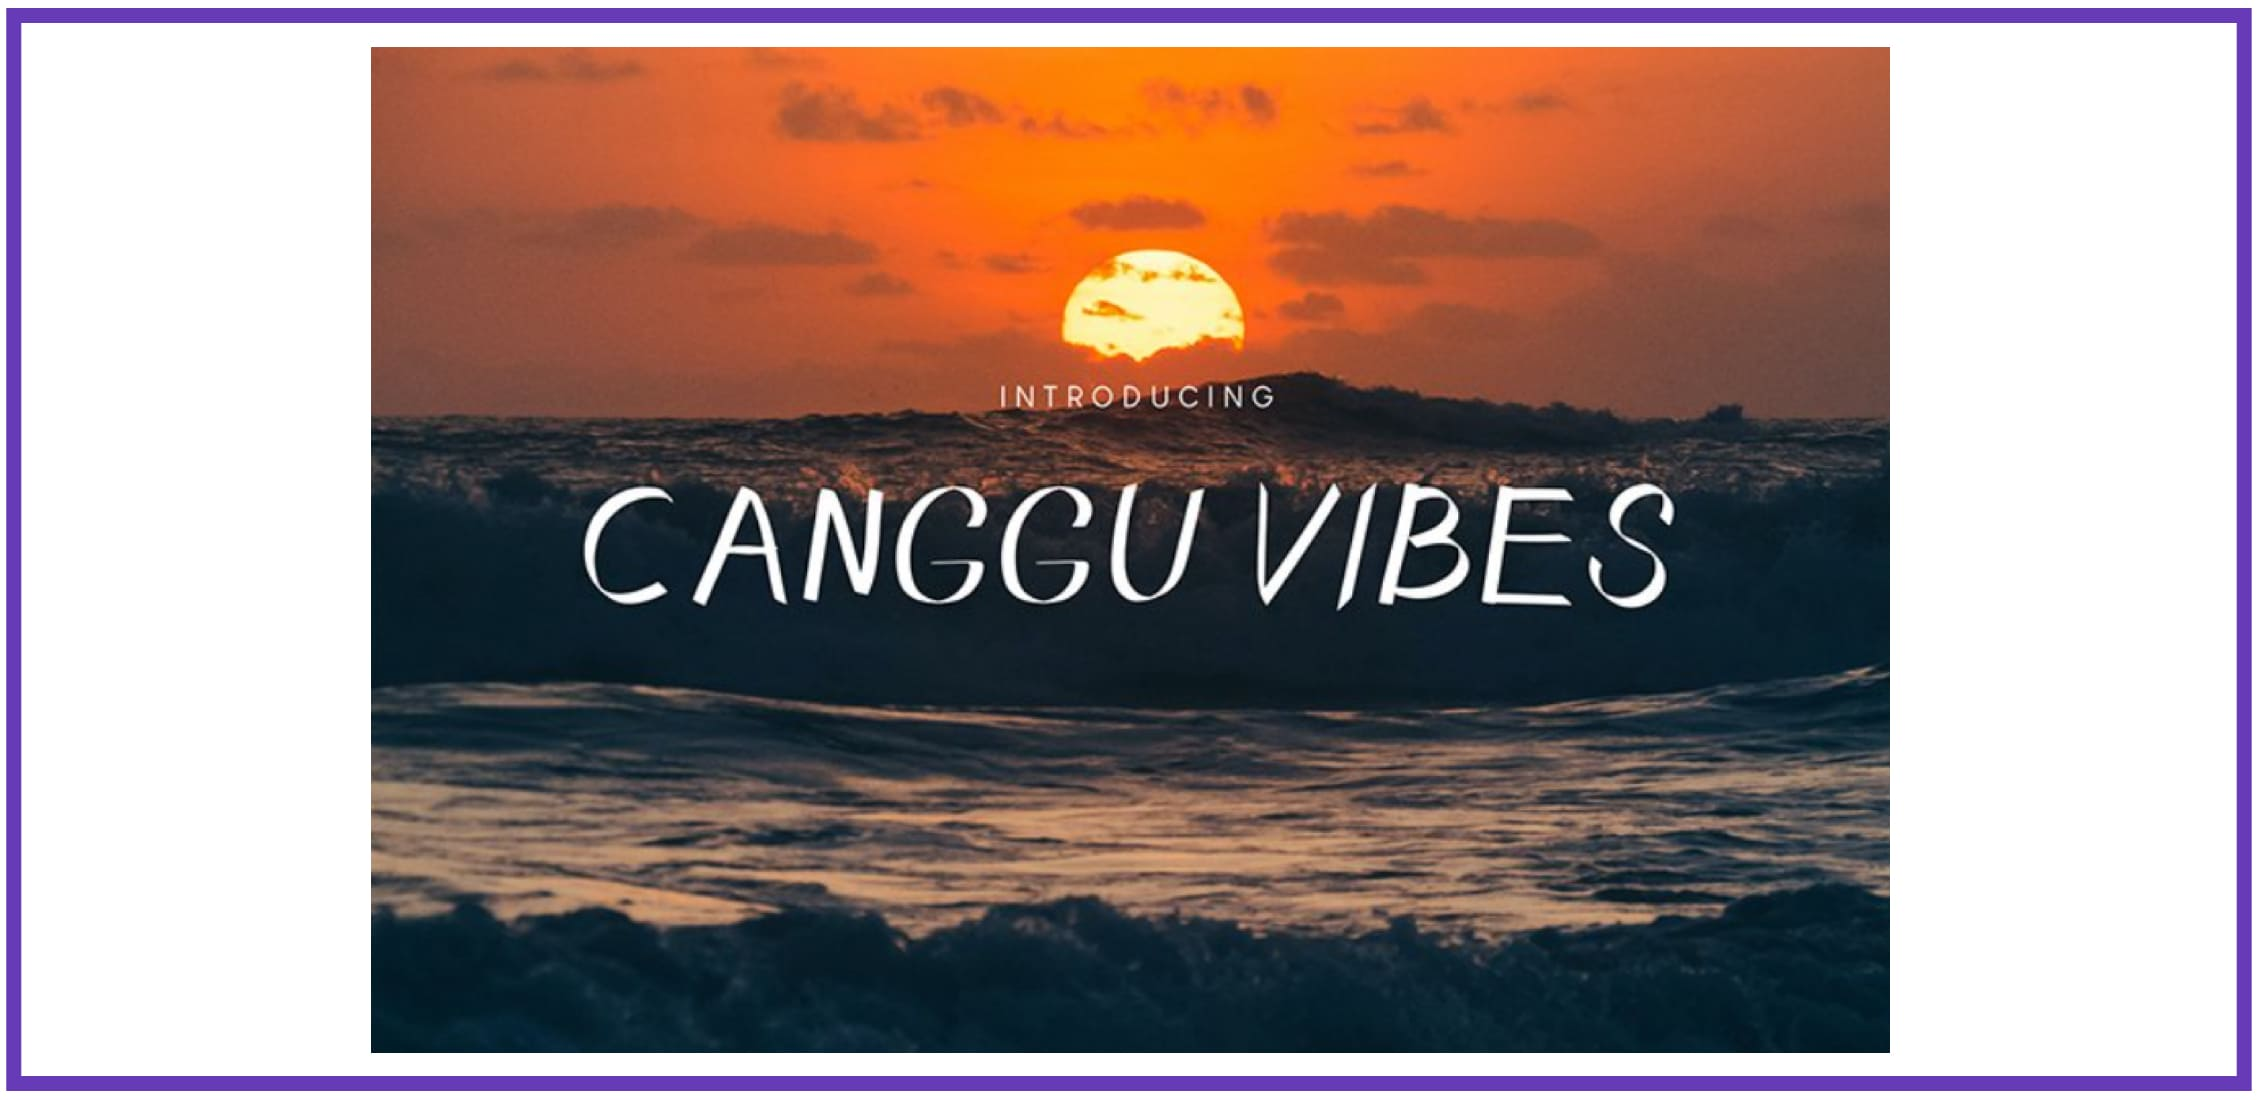 Canggu Vibes Script Font By Hishand studio. Tropical Font.